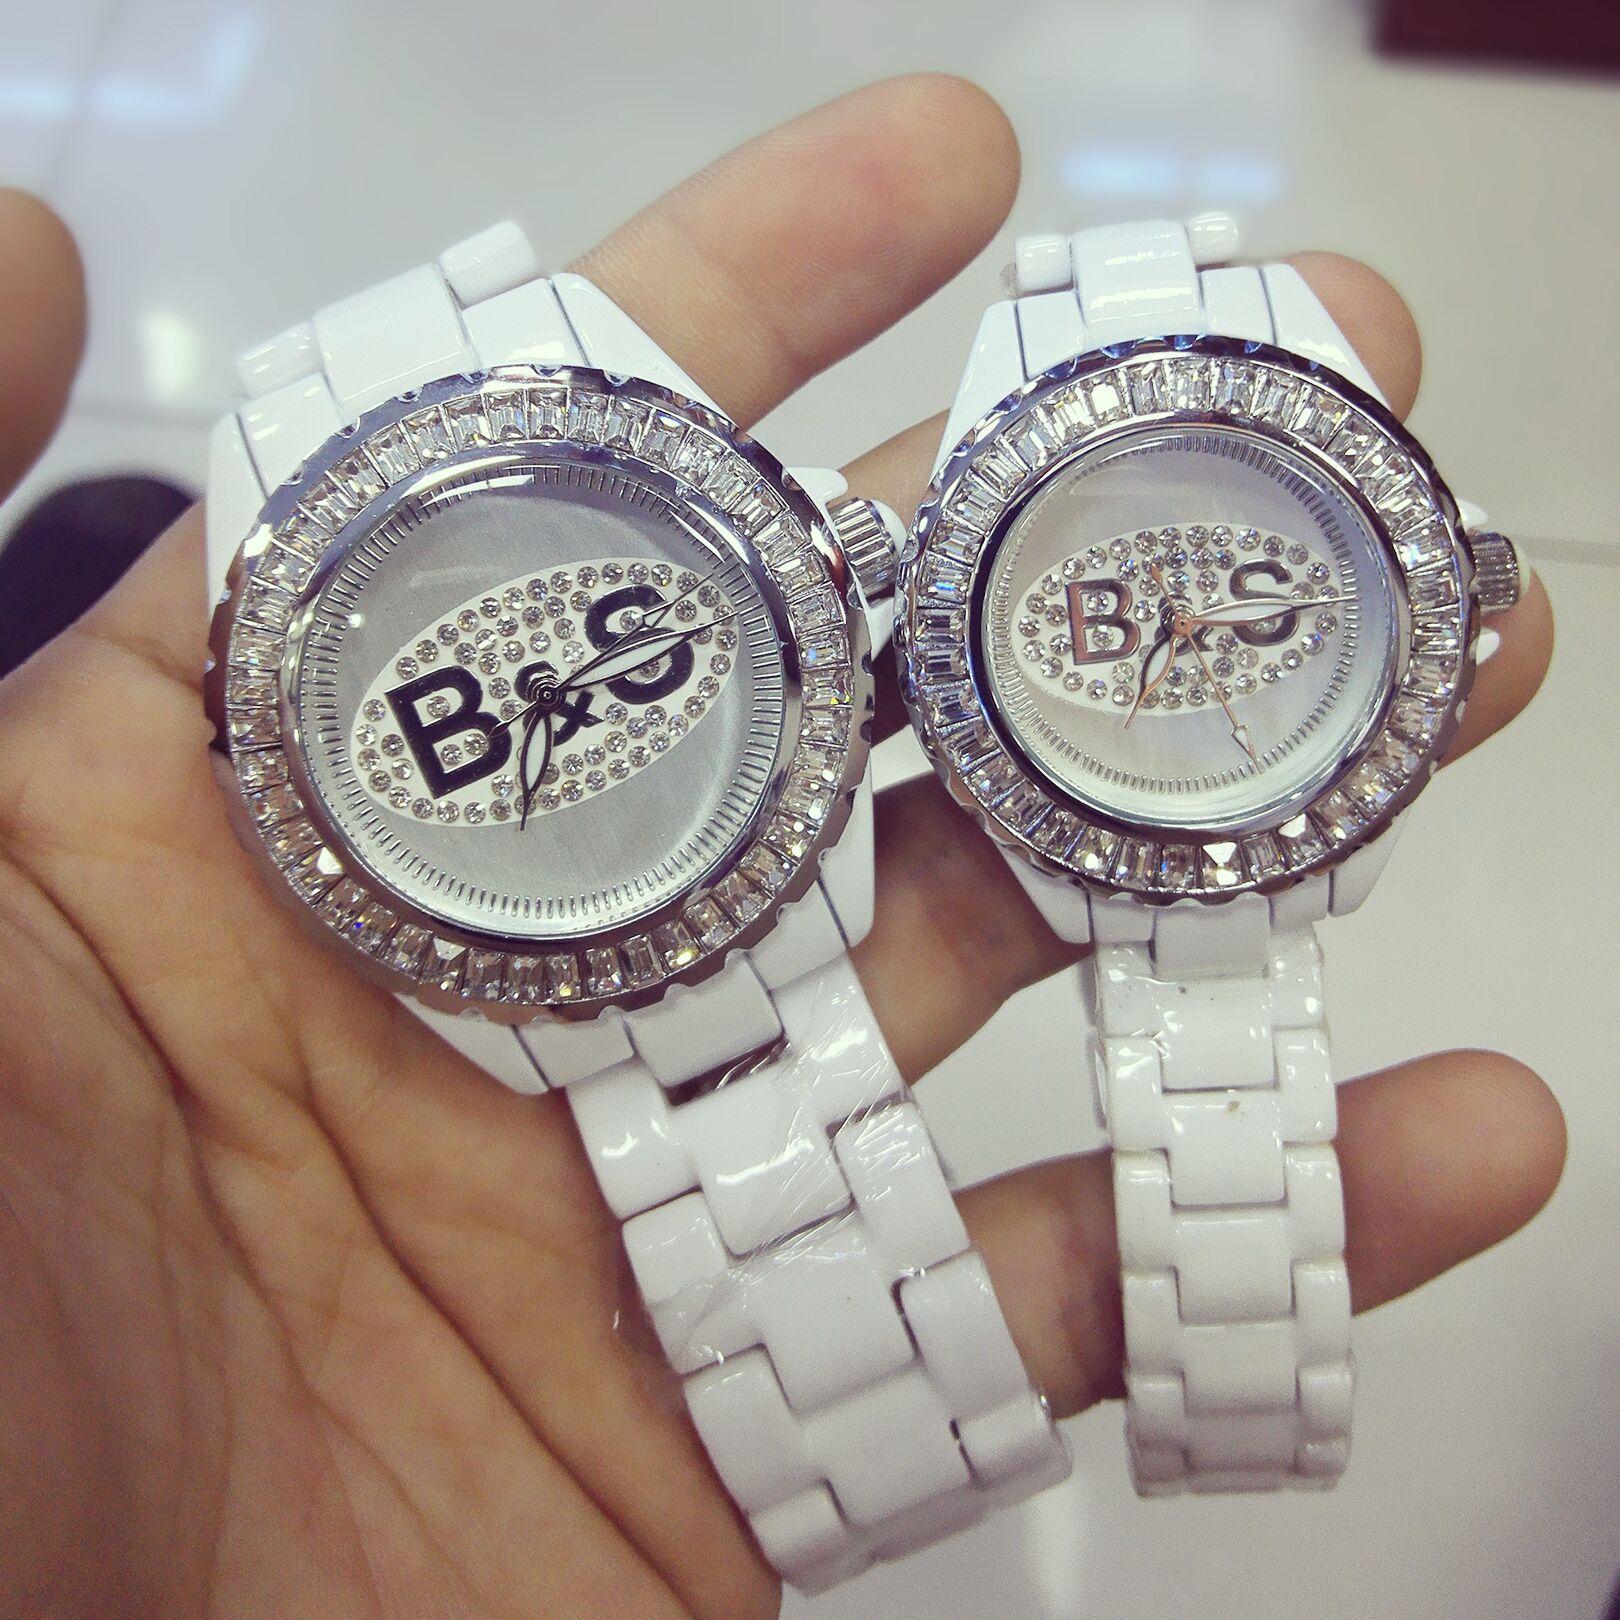 FA0753 Наручные Часы Женщин Дамы Повседневная мода Бренд Знаменитые часы Часы Кварцевые Часы Девушка Montre Роковой Relógio Feminino